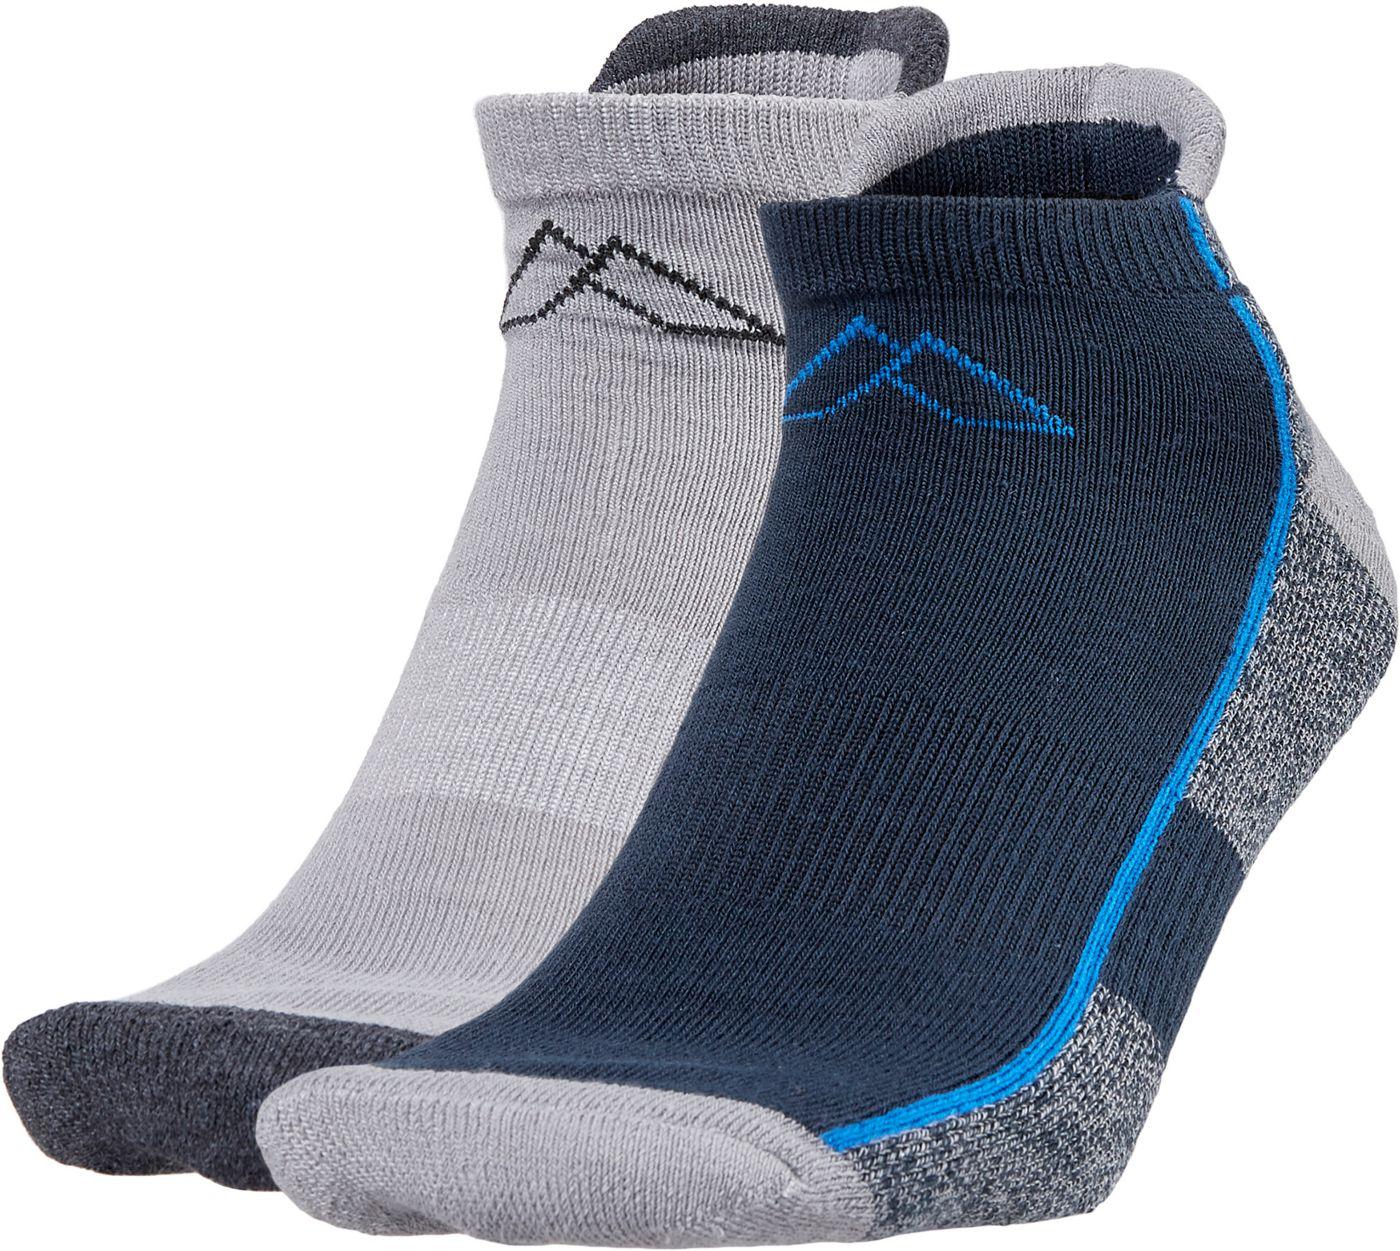 Alpine Design Men's Lowcut Hiking Socks - 2 Pack